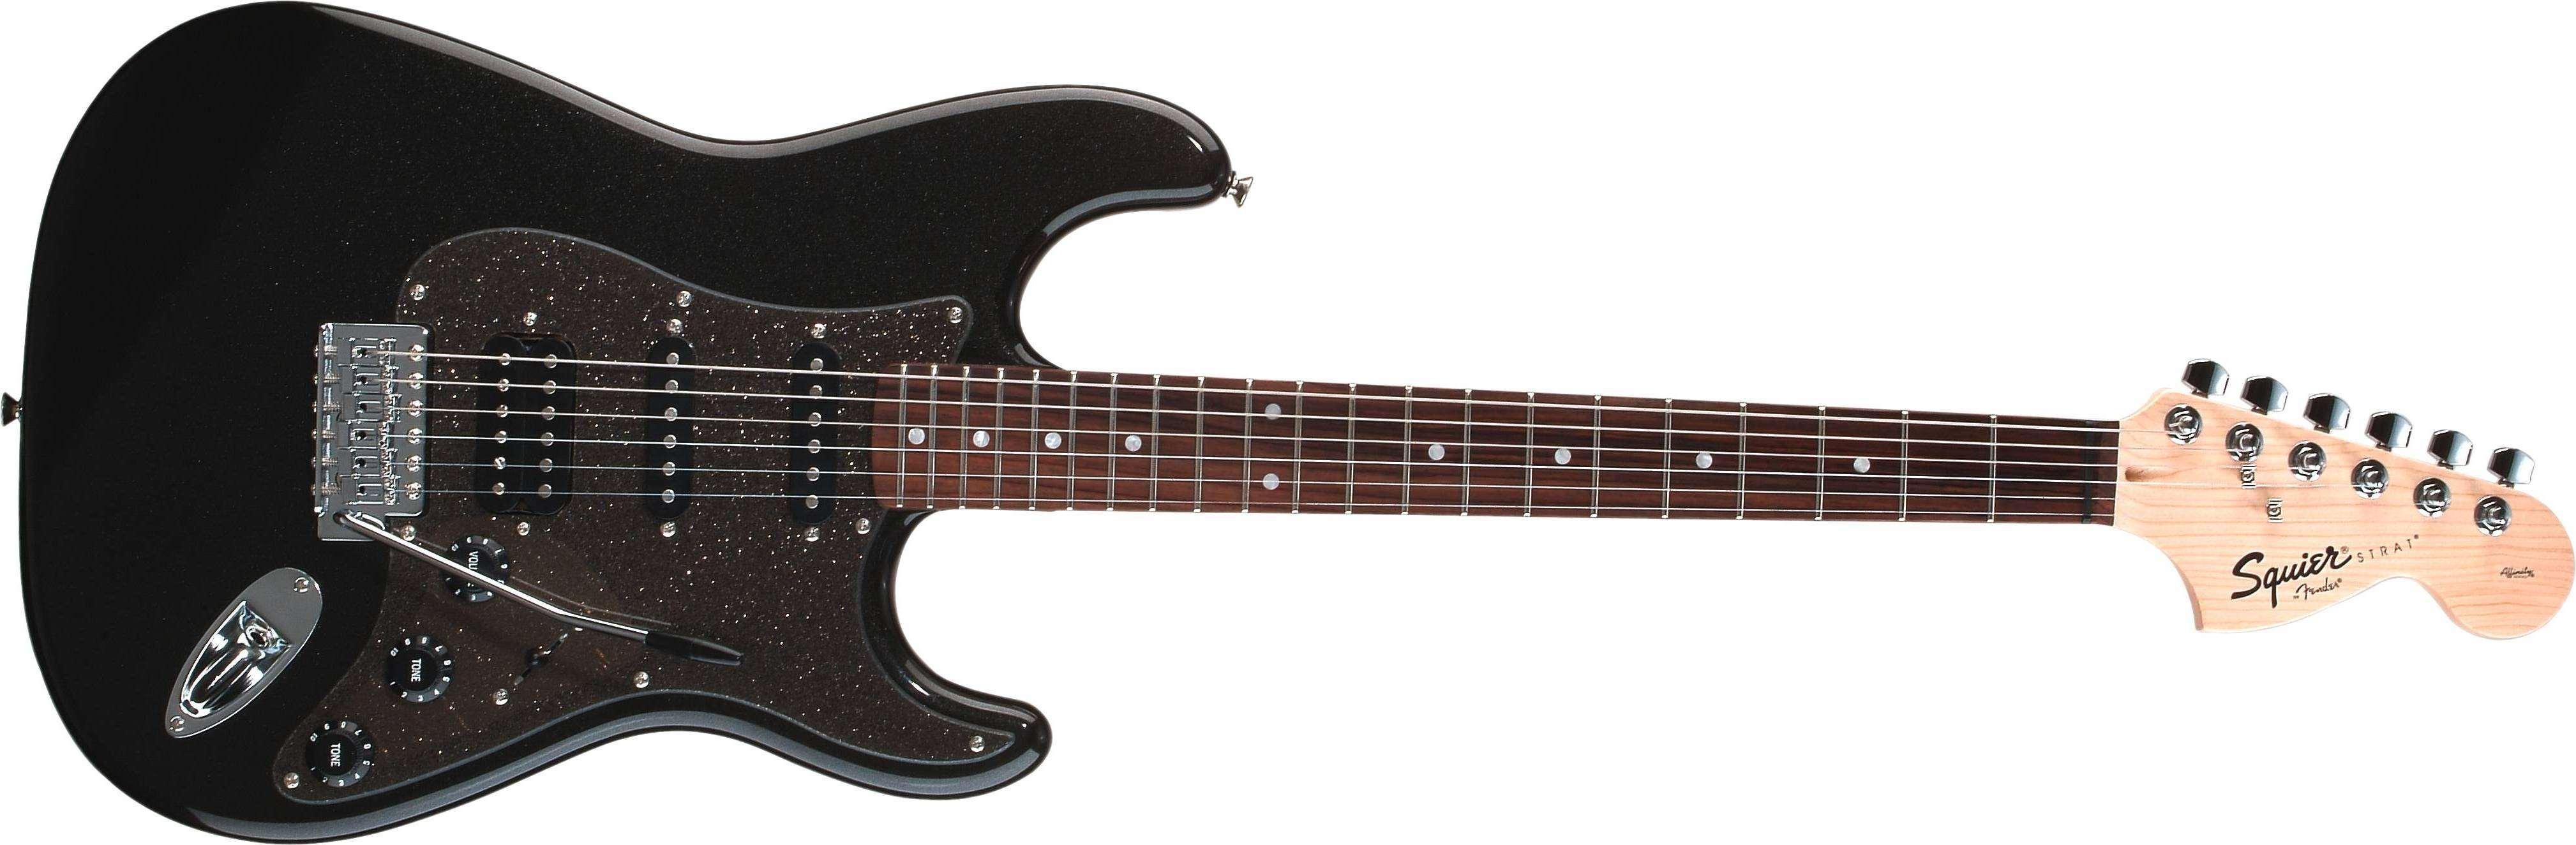 Affinity Series Stratocaster HSS - Montego Black Metallic